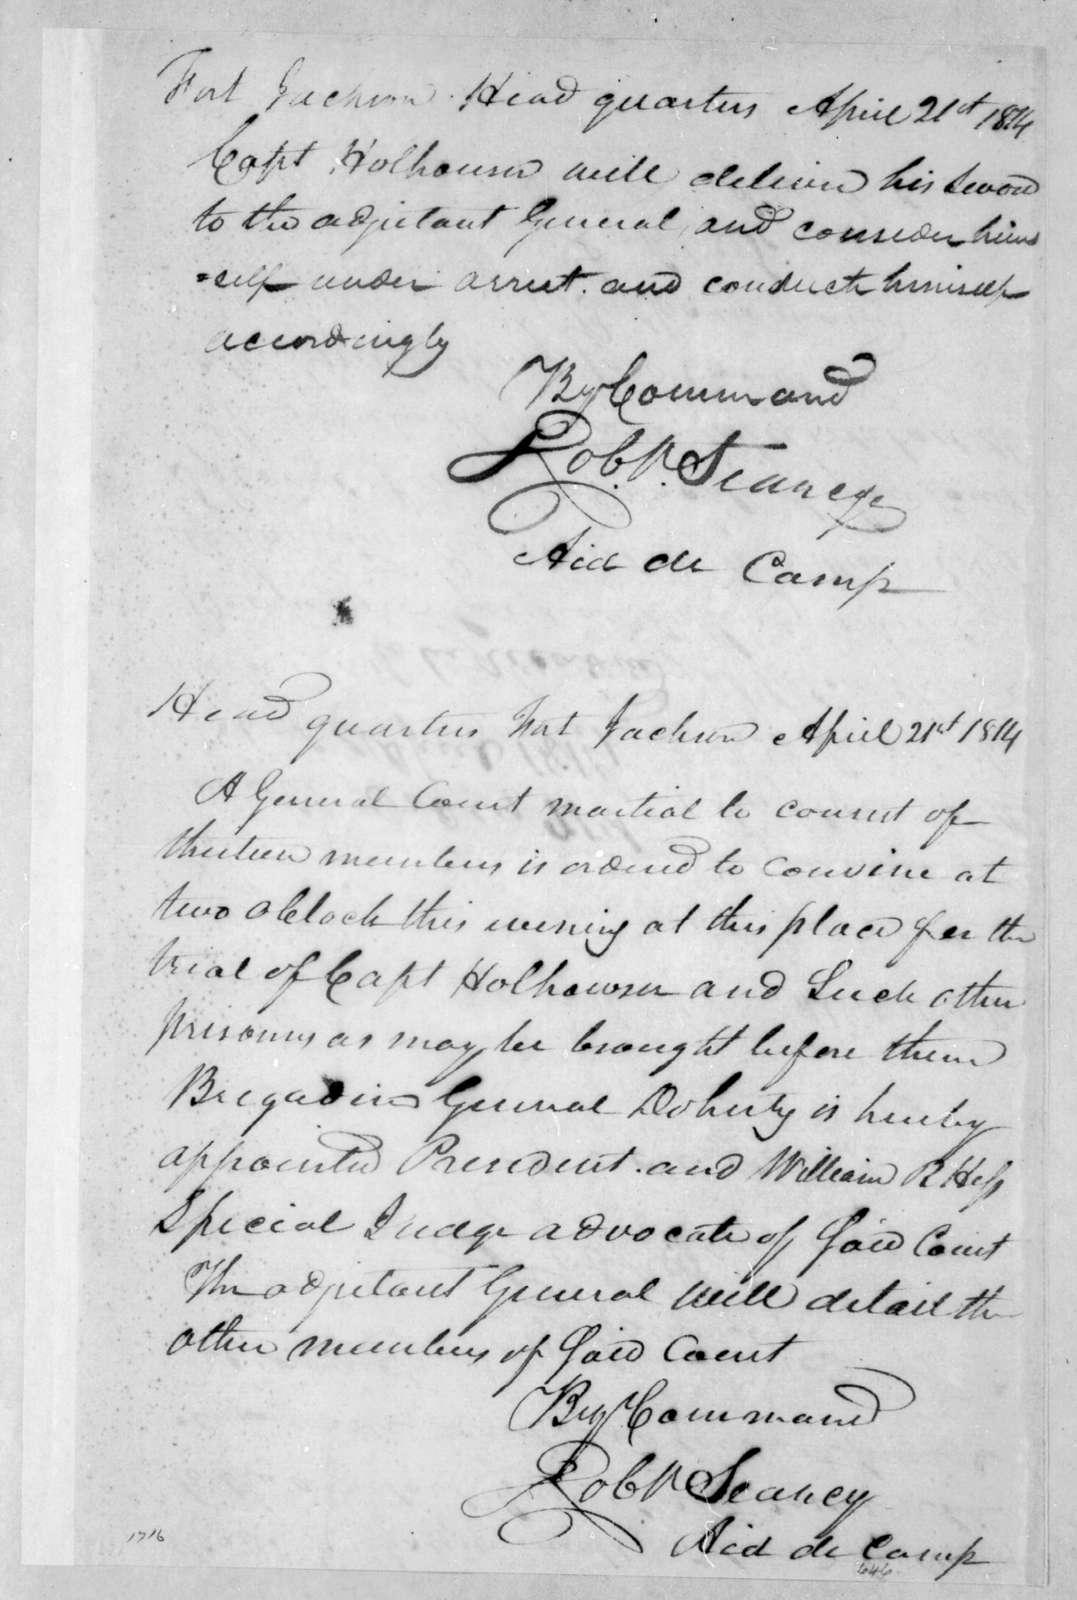 Robert Searcy to J. Graham, April 21, 1814